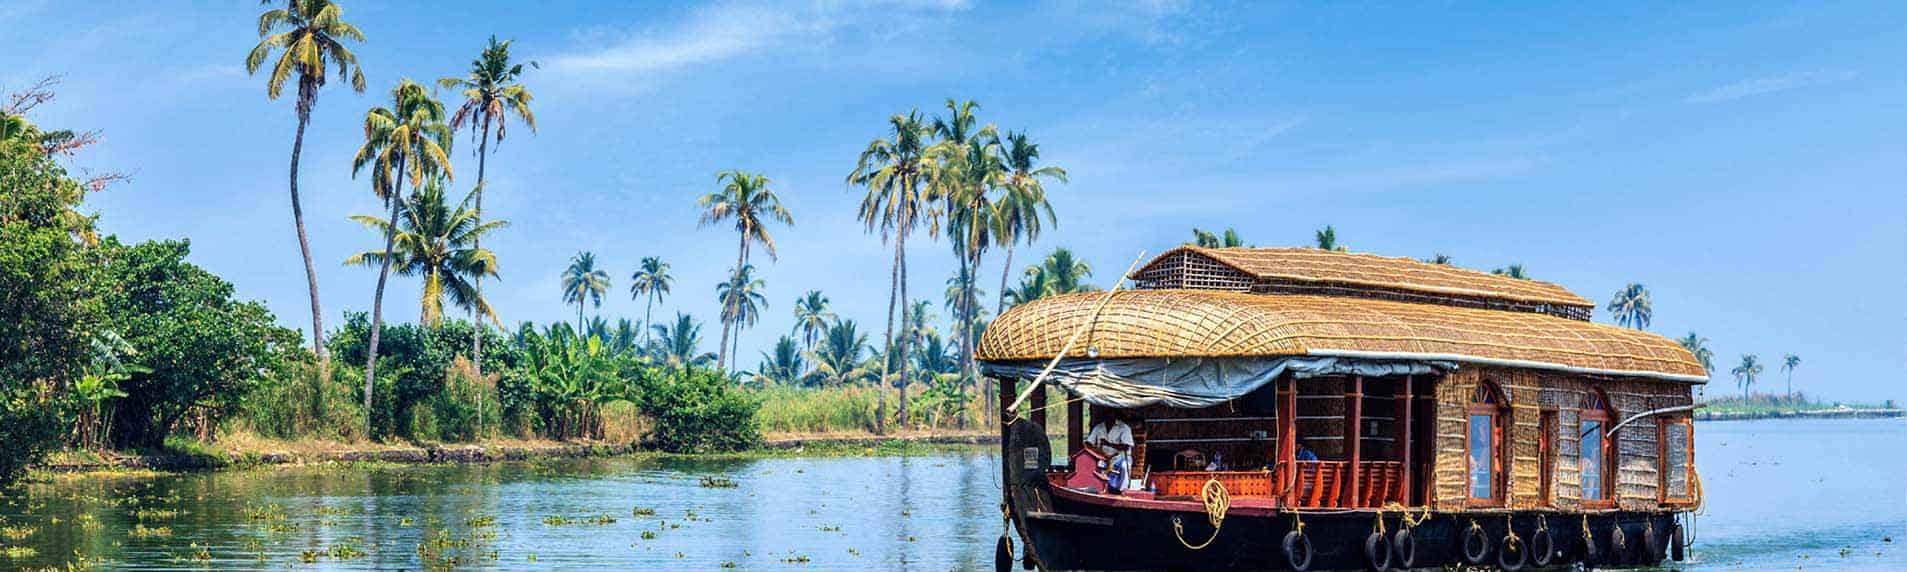 Grand Kerala Retreat 6 Nights 7 Days